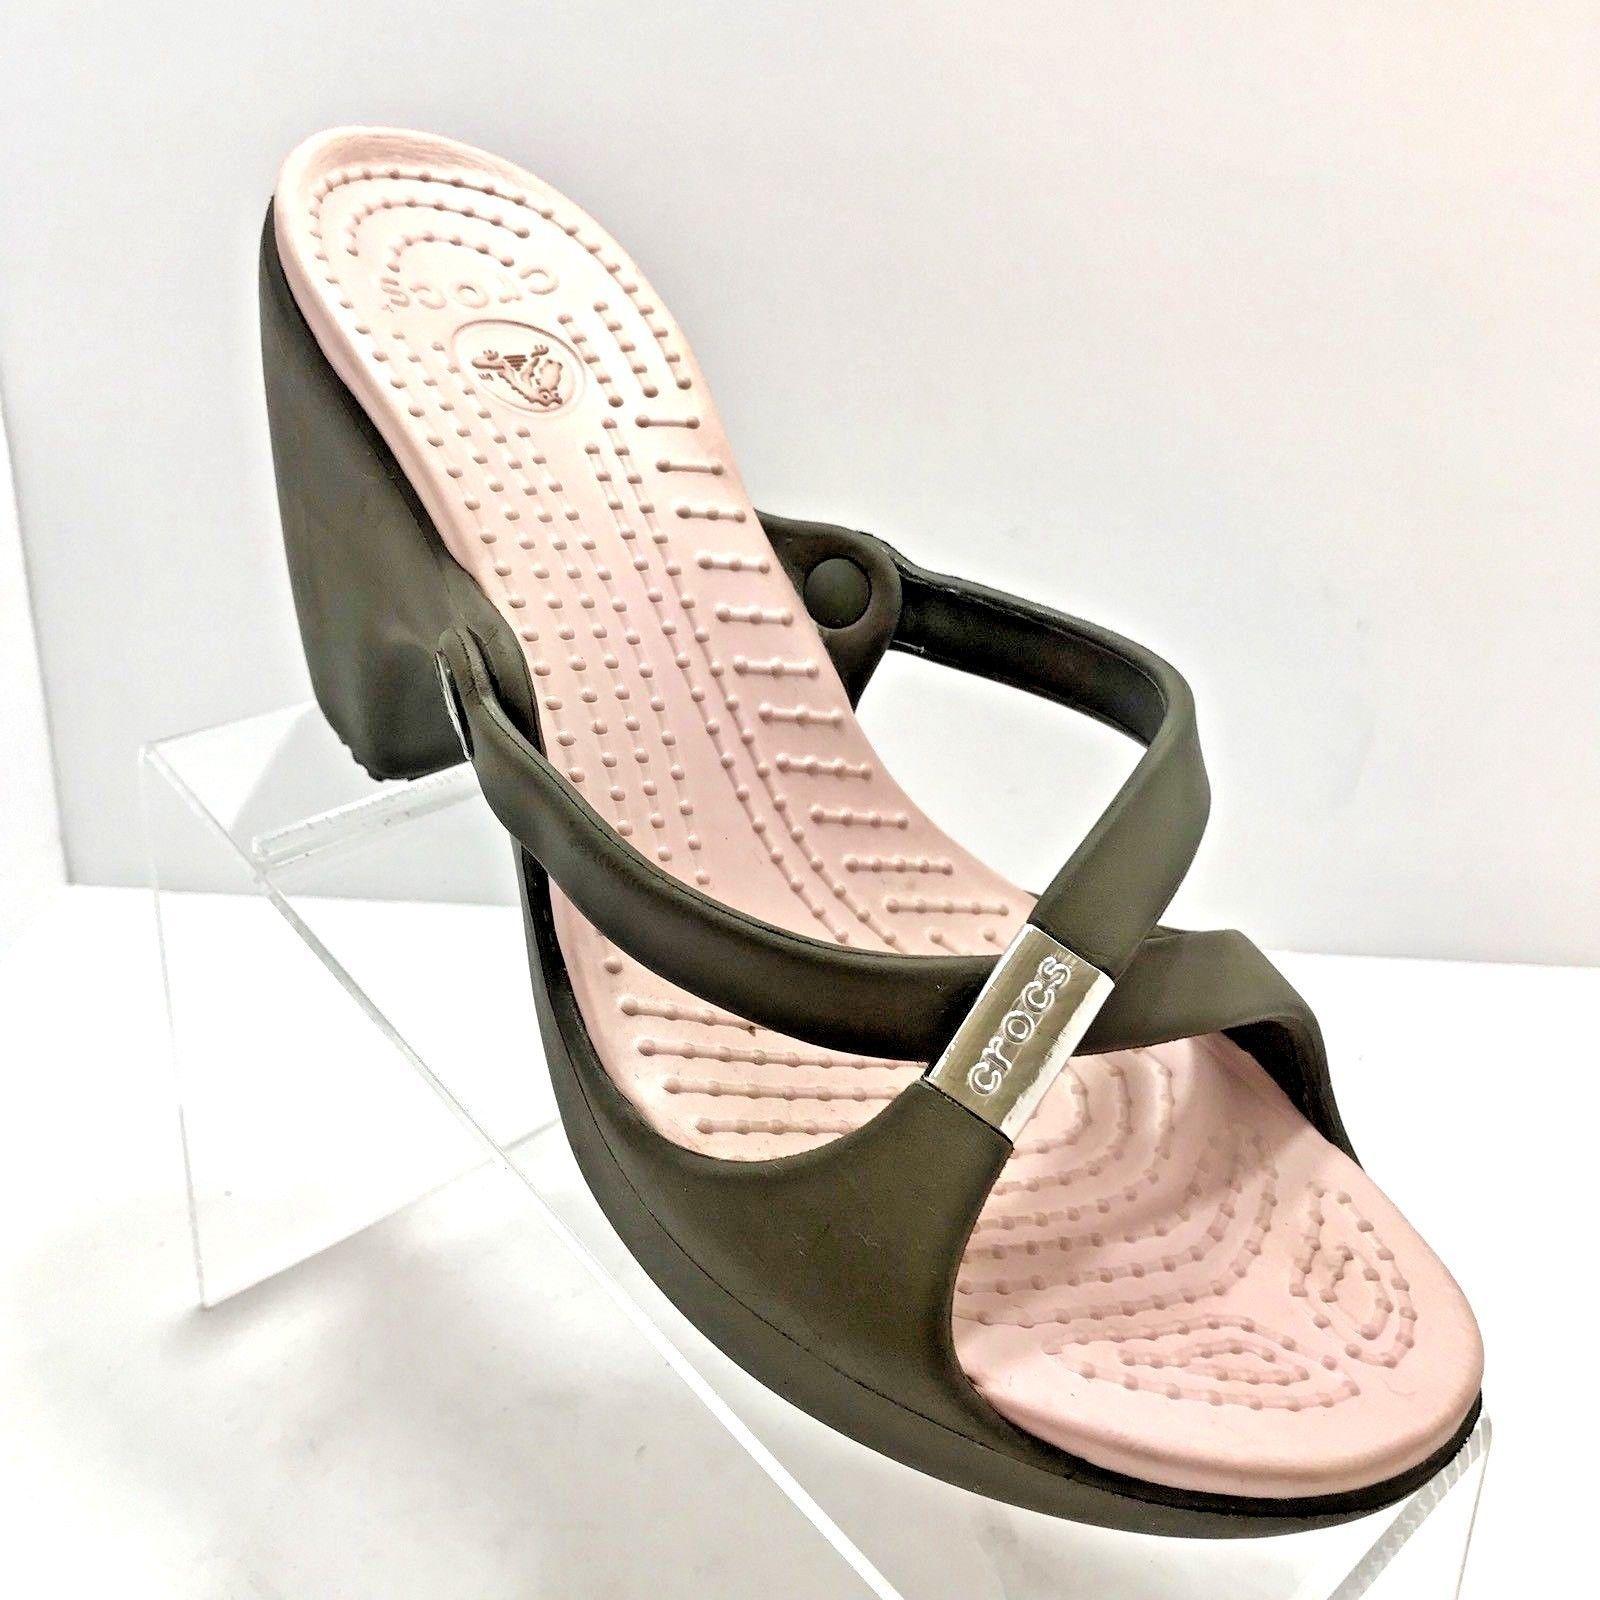 61087d0443 CROCS Cyprus Strap Sandals Platform Wedge Heels GRAY PINK Size 10 Womens EU  41.5 | eBay